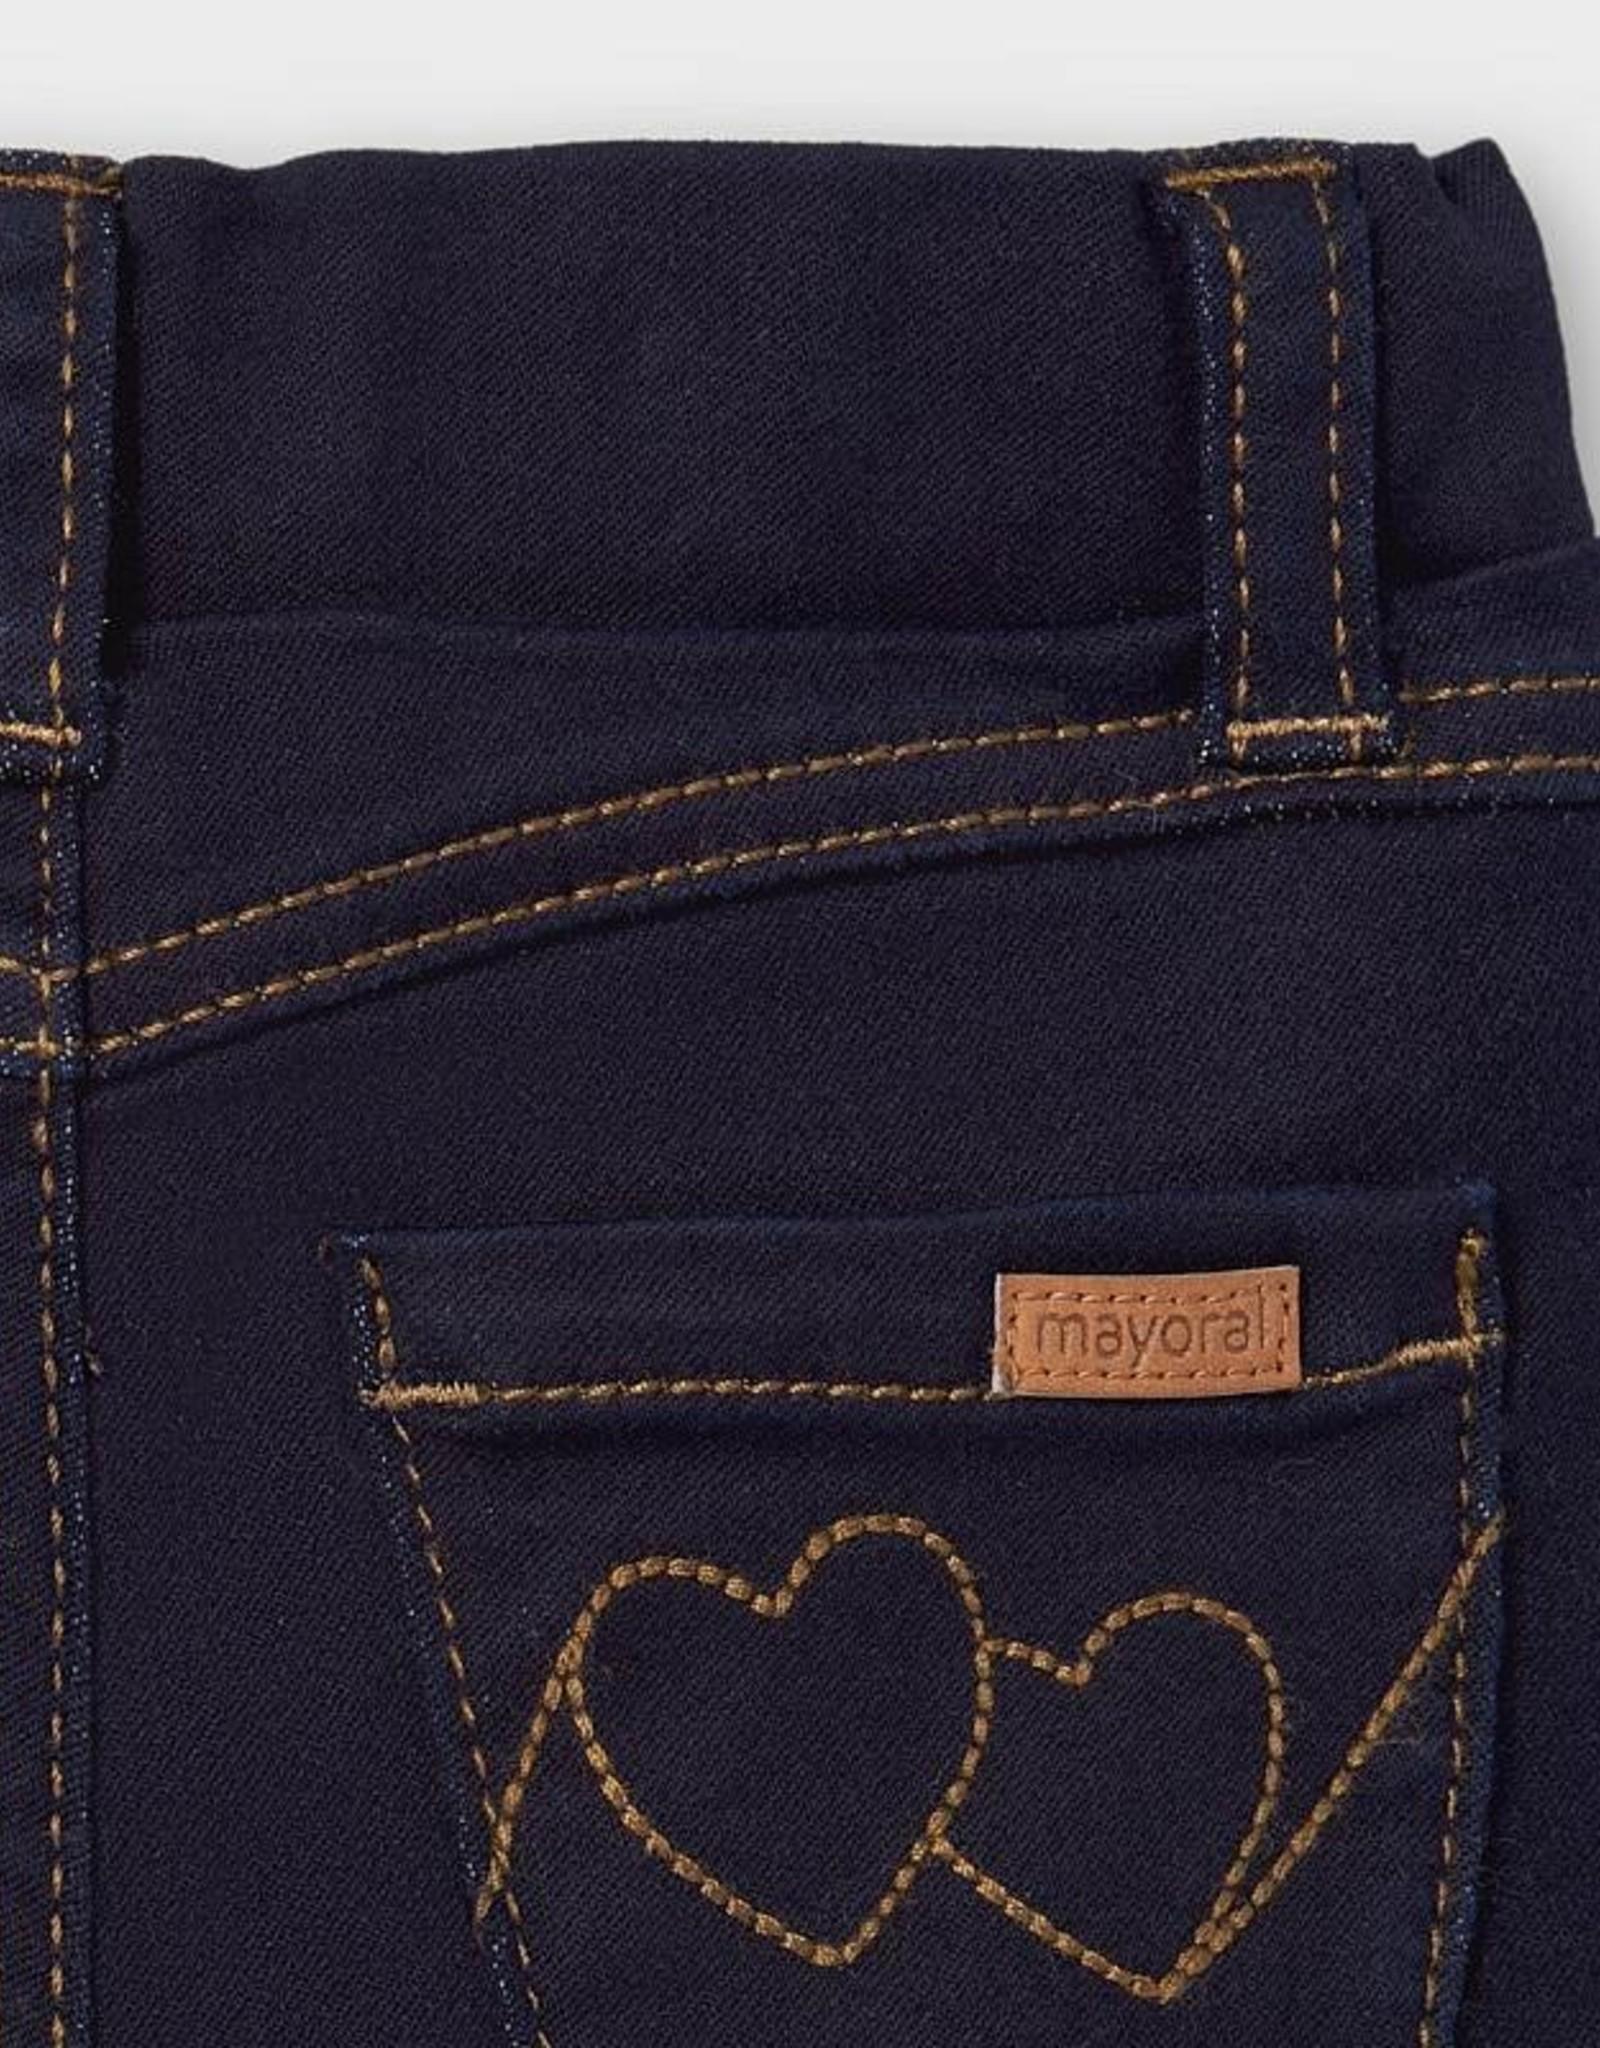 Super Skinny Dark Denim - Two Heart Pocket